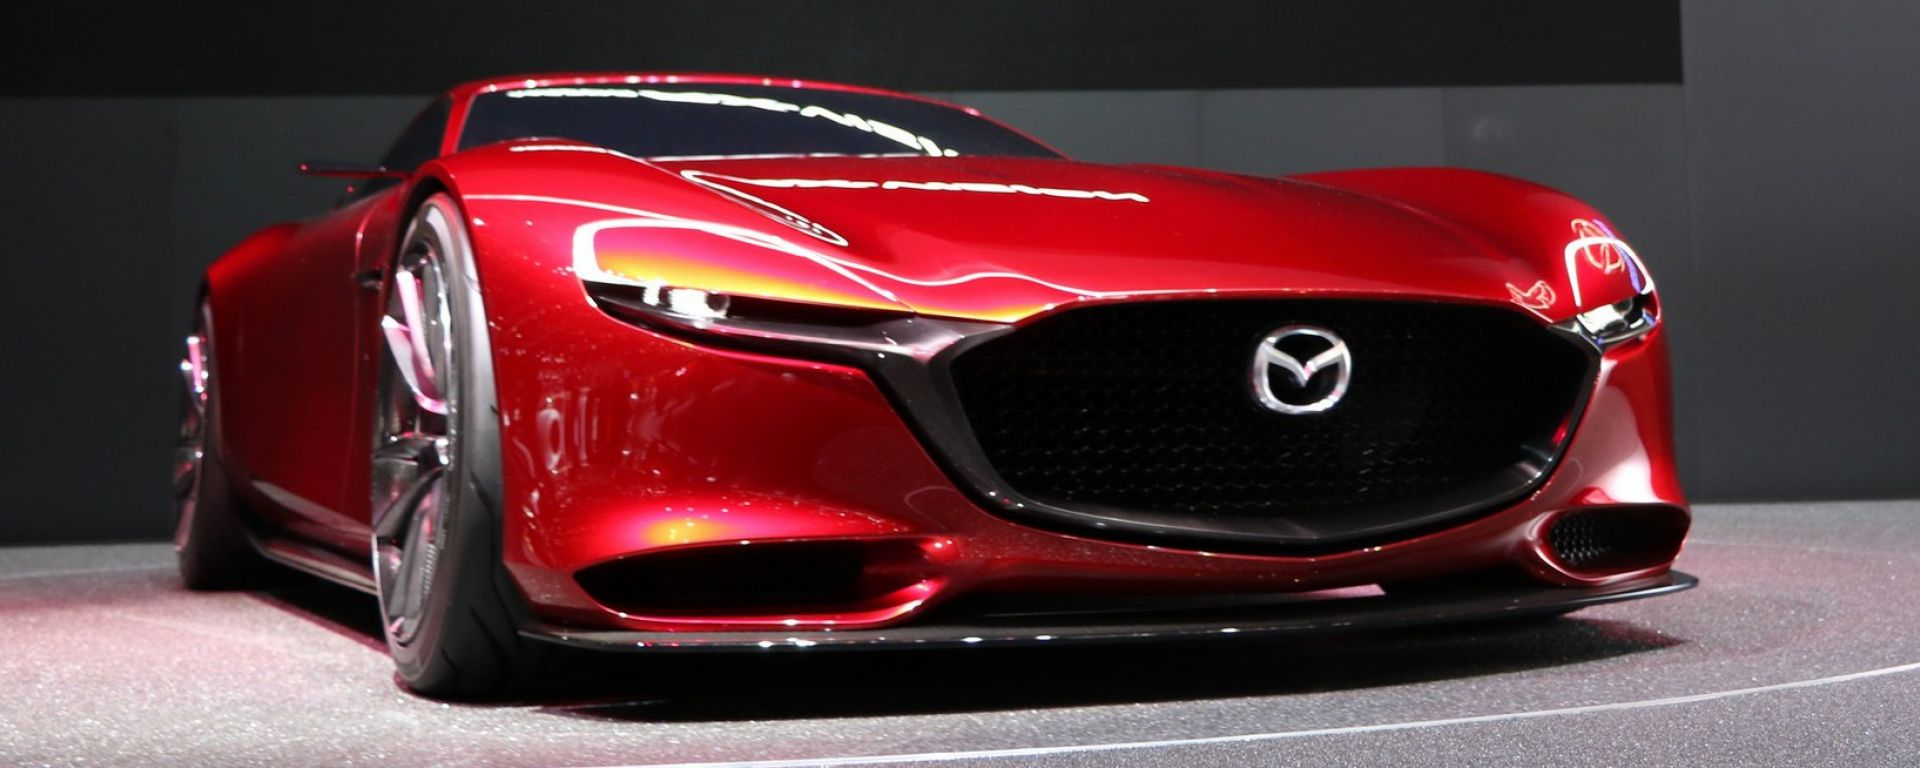 Ginevra 2016 - Notizie dalle Case: Mazda